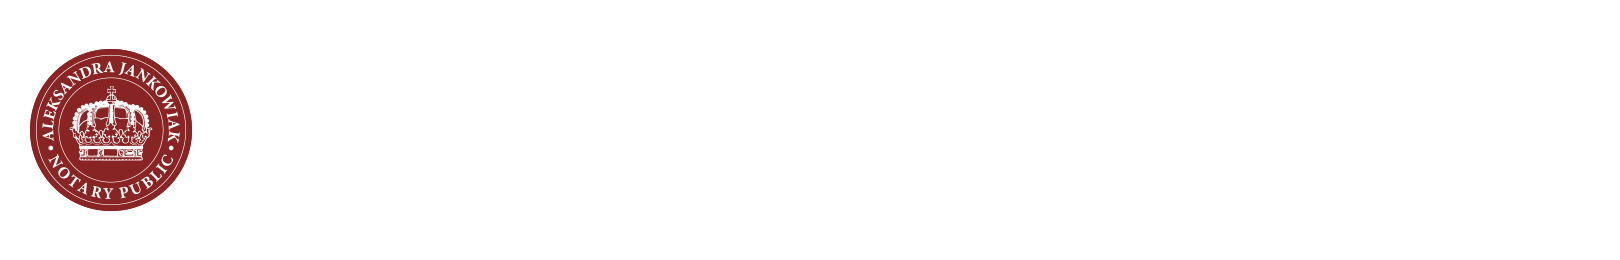 Aleksandra Jankowiak | Notary Of West London Ltd Logo